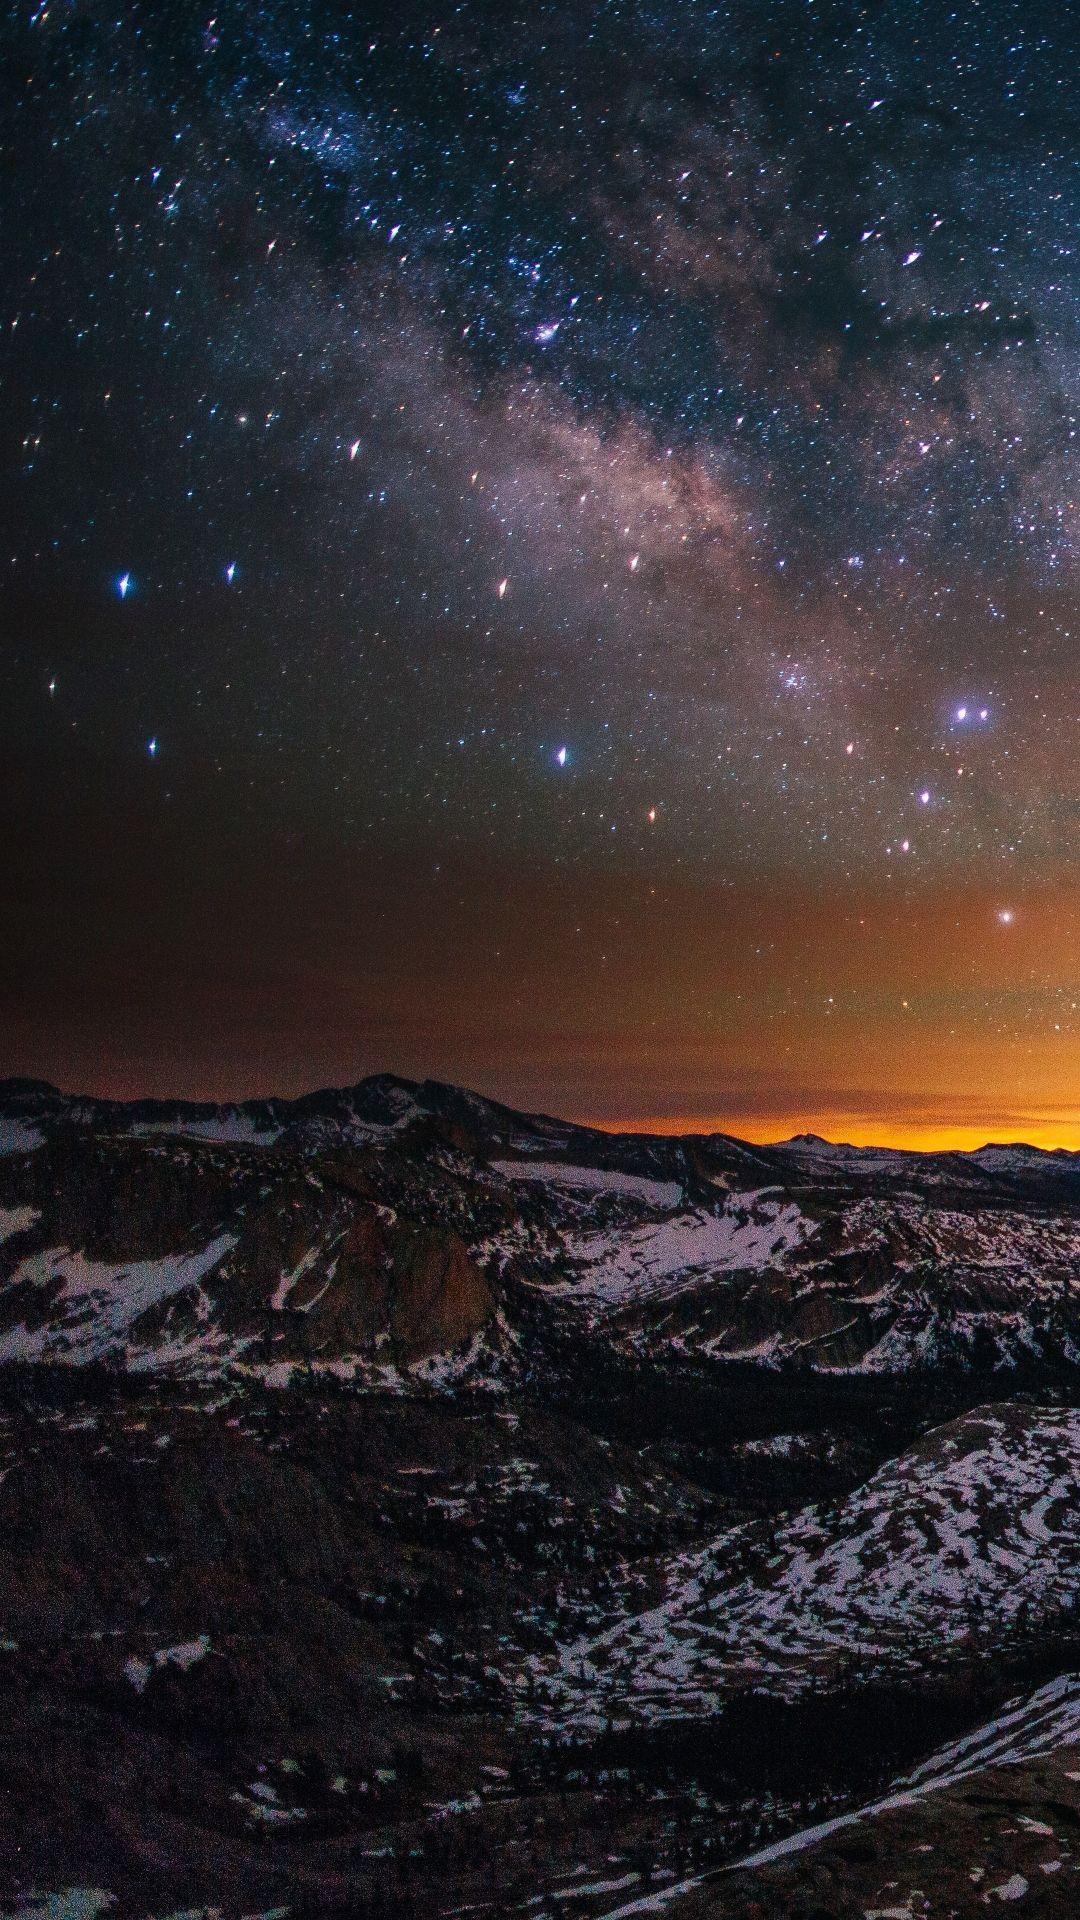 Earth Landscape Galaxy Stars (1080x1920) Mobile Wallpaper